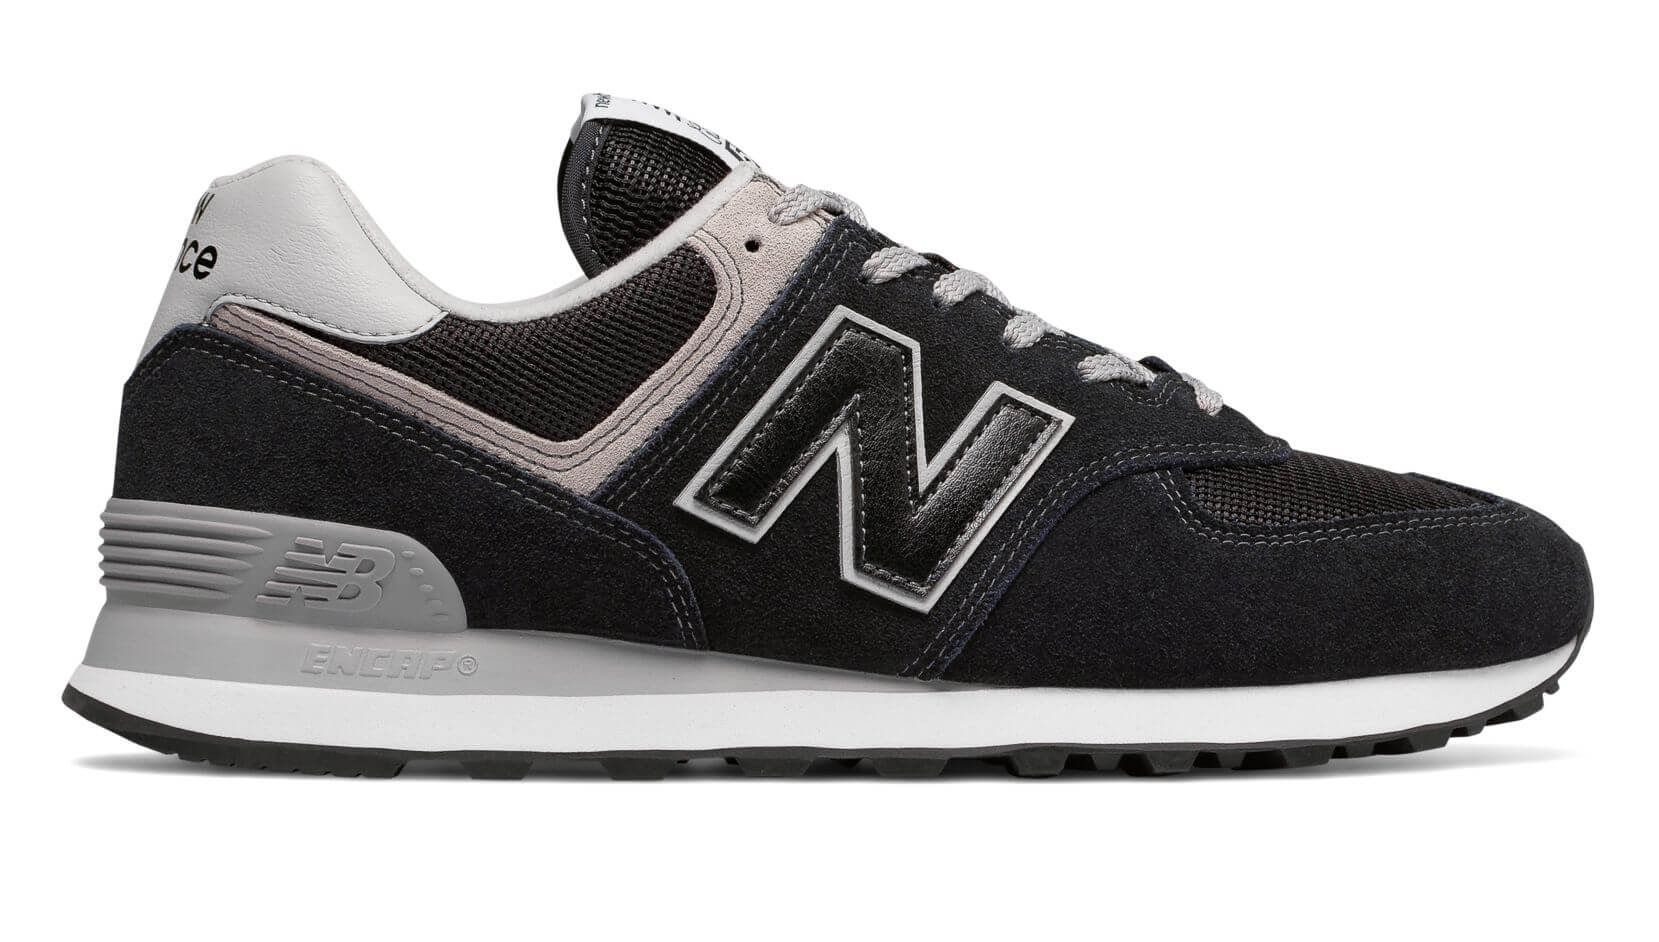 New Balance 574 laces